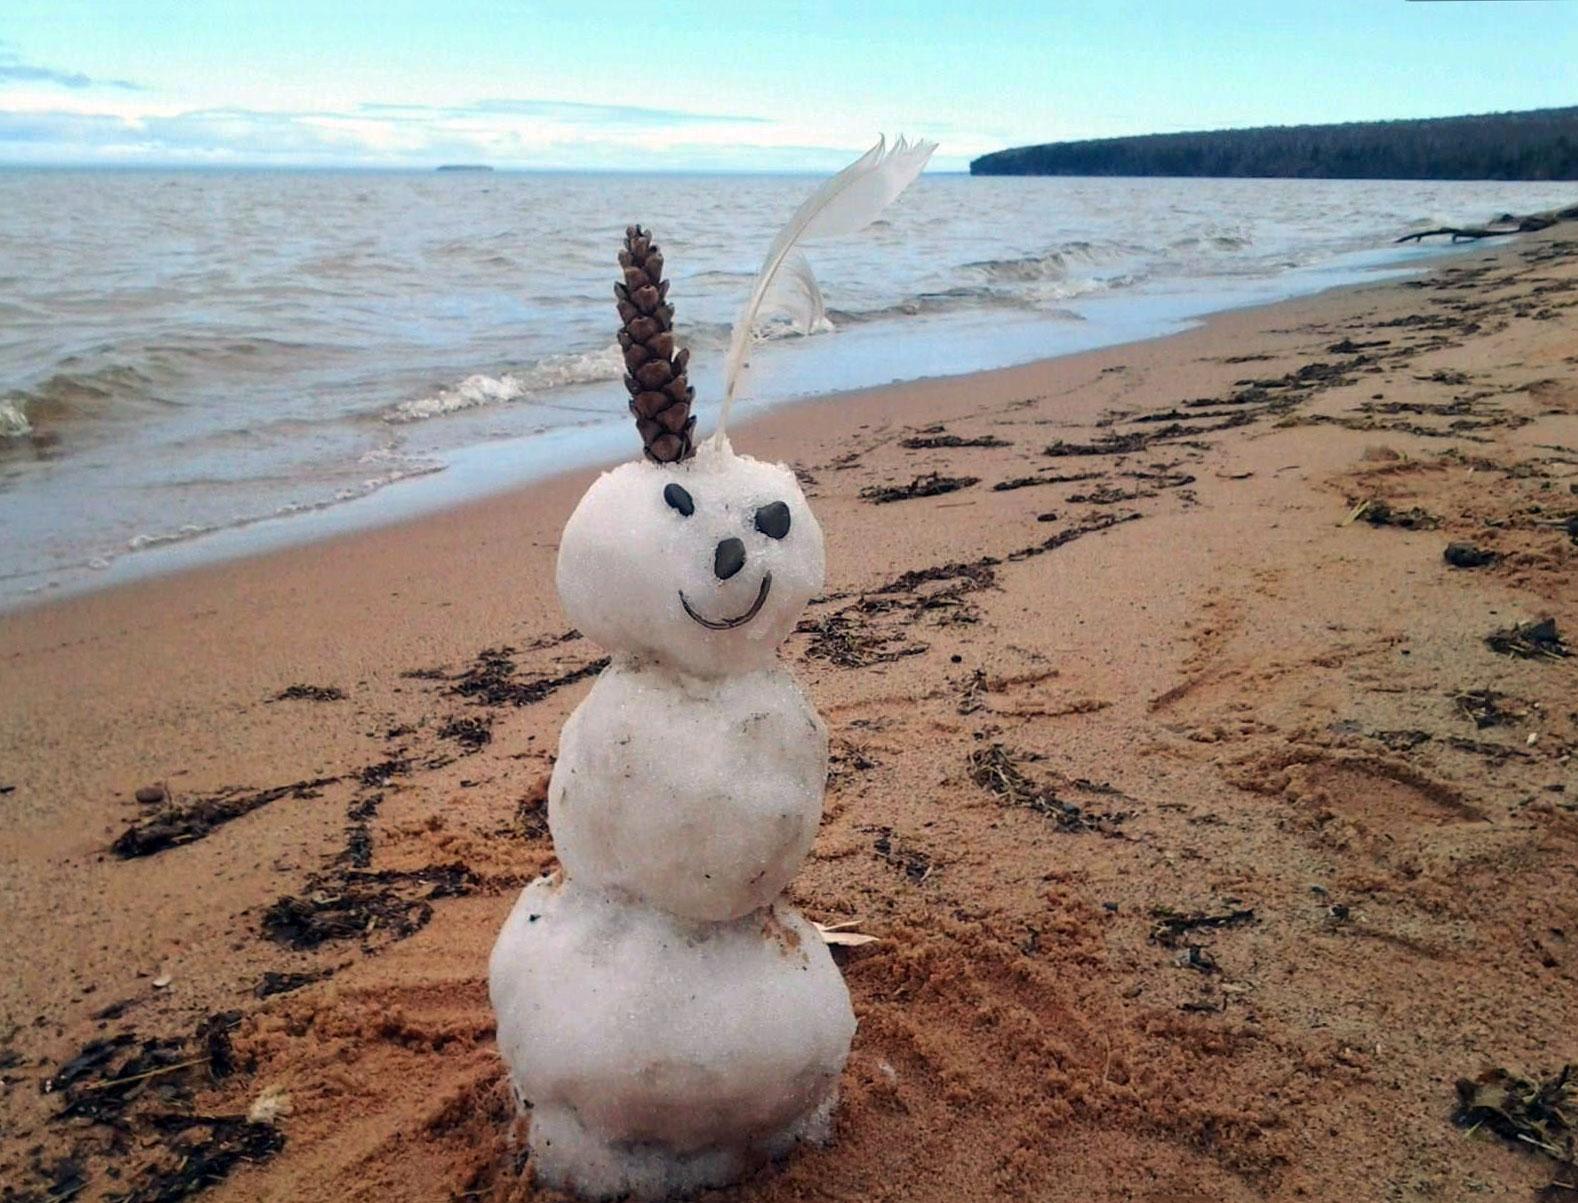 Early season visitor at Meyers Beach